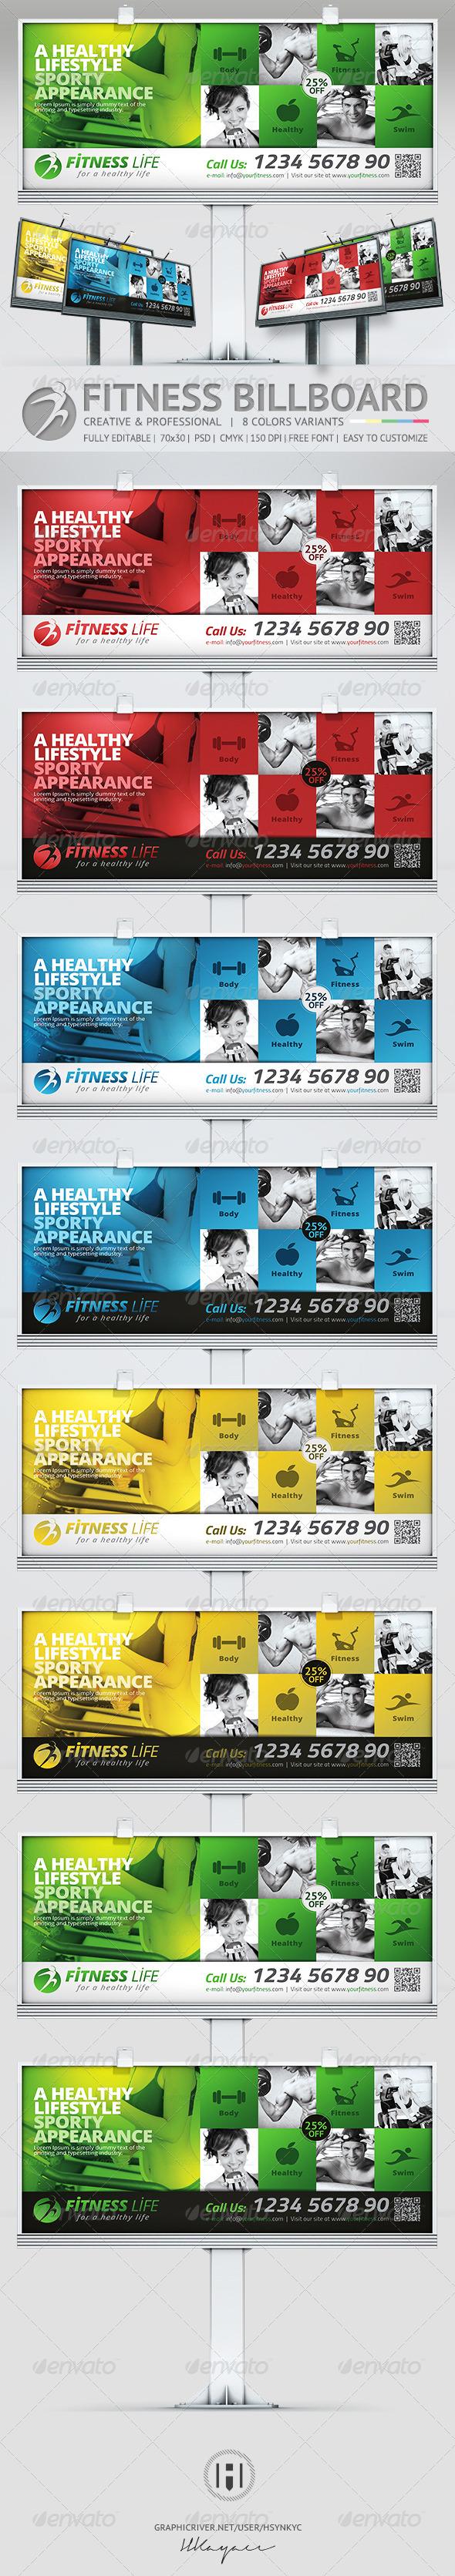 7 fitness